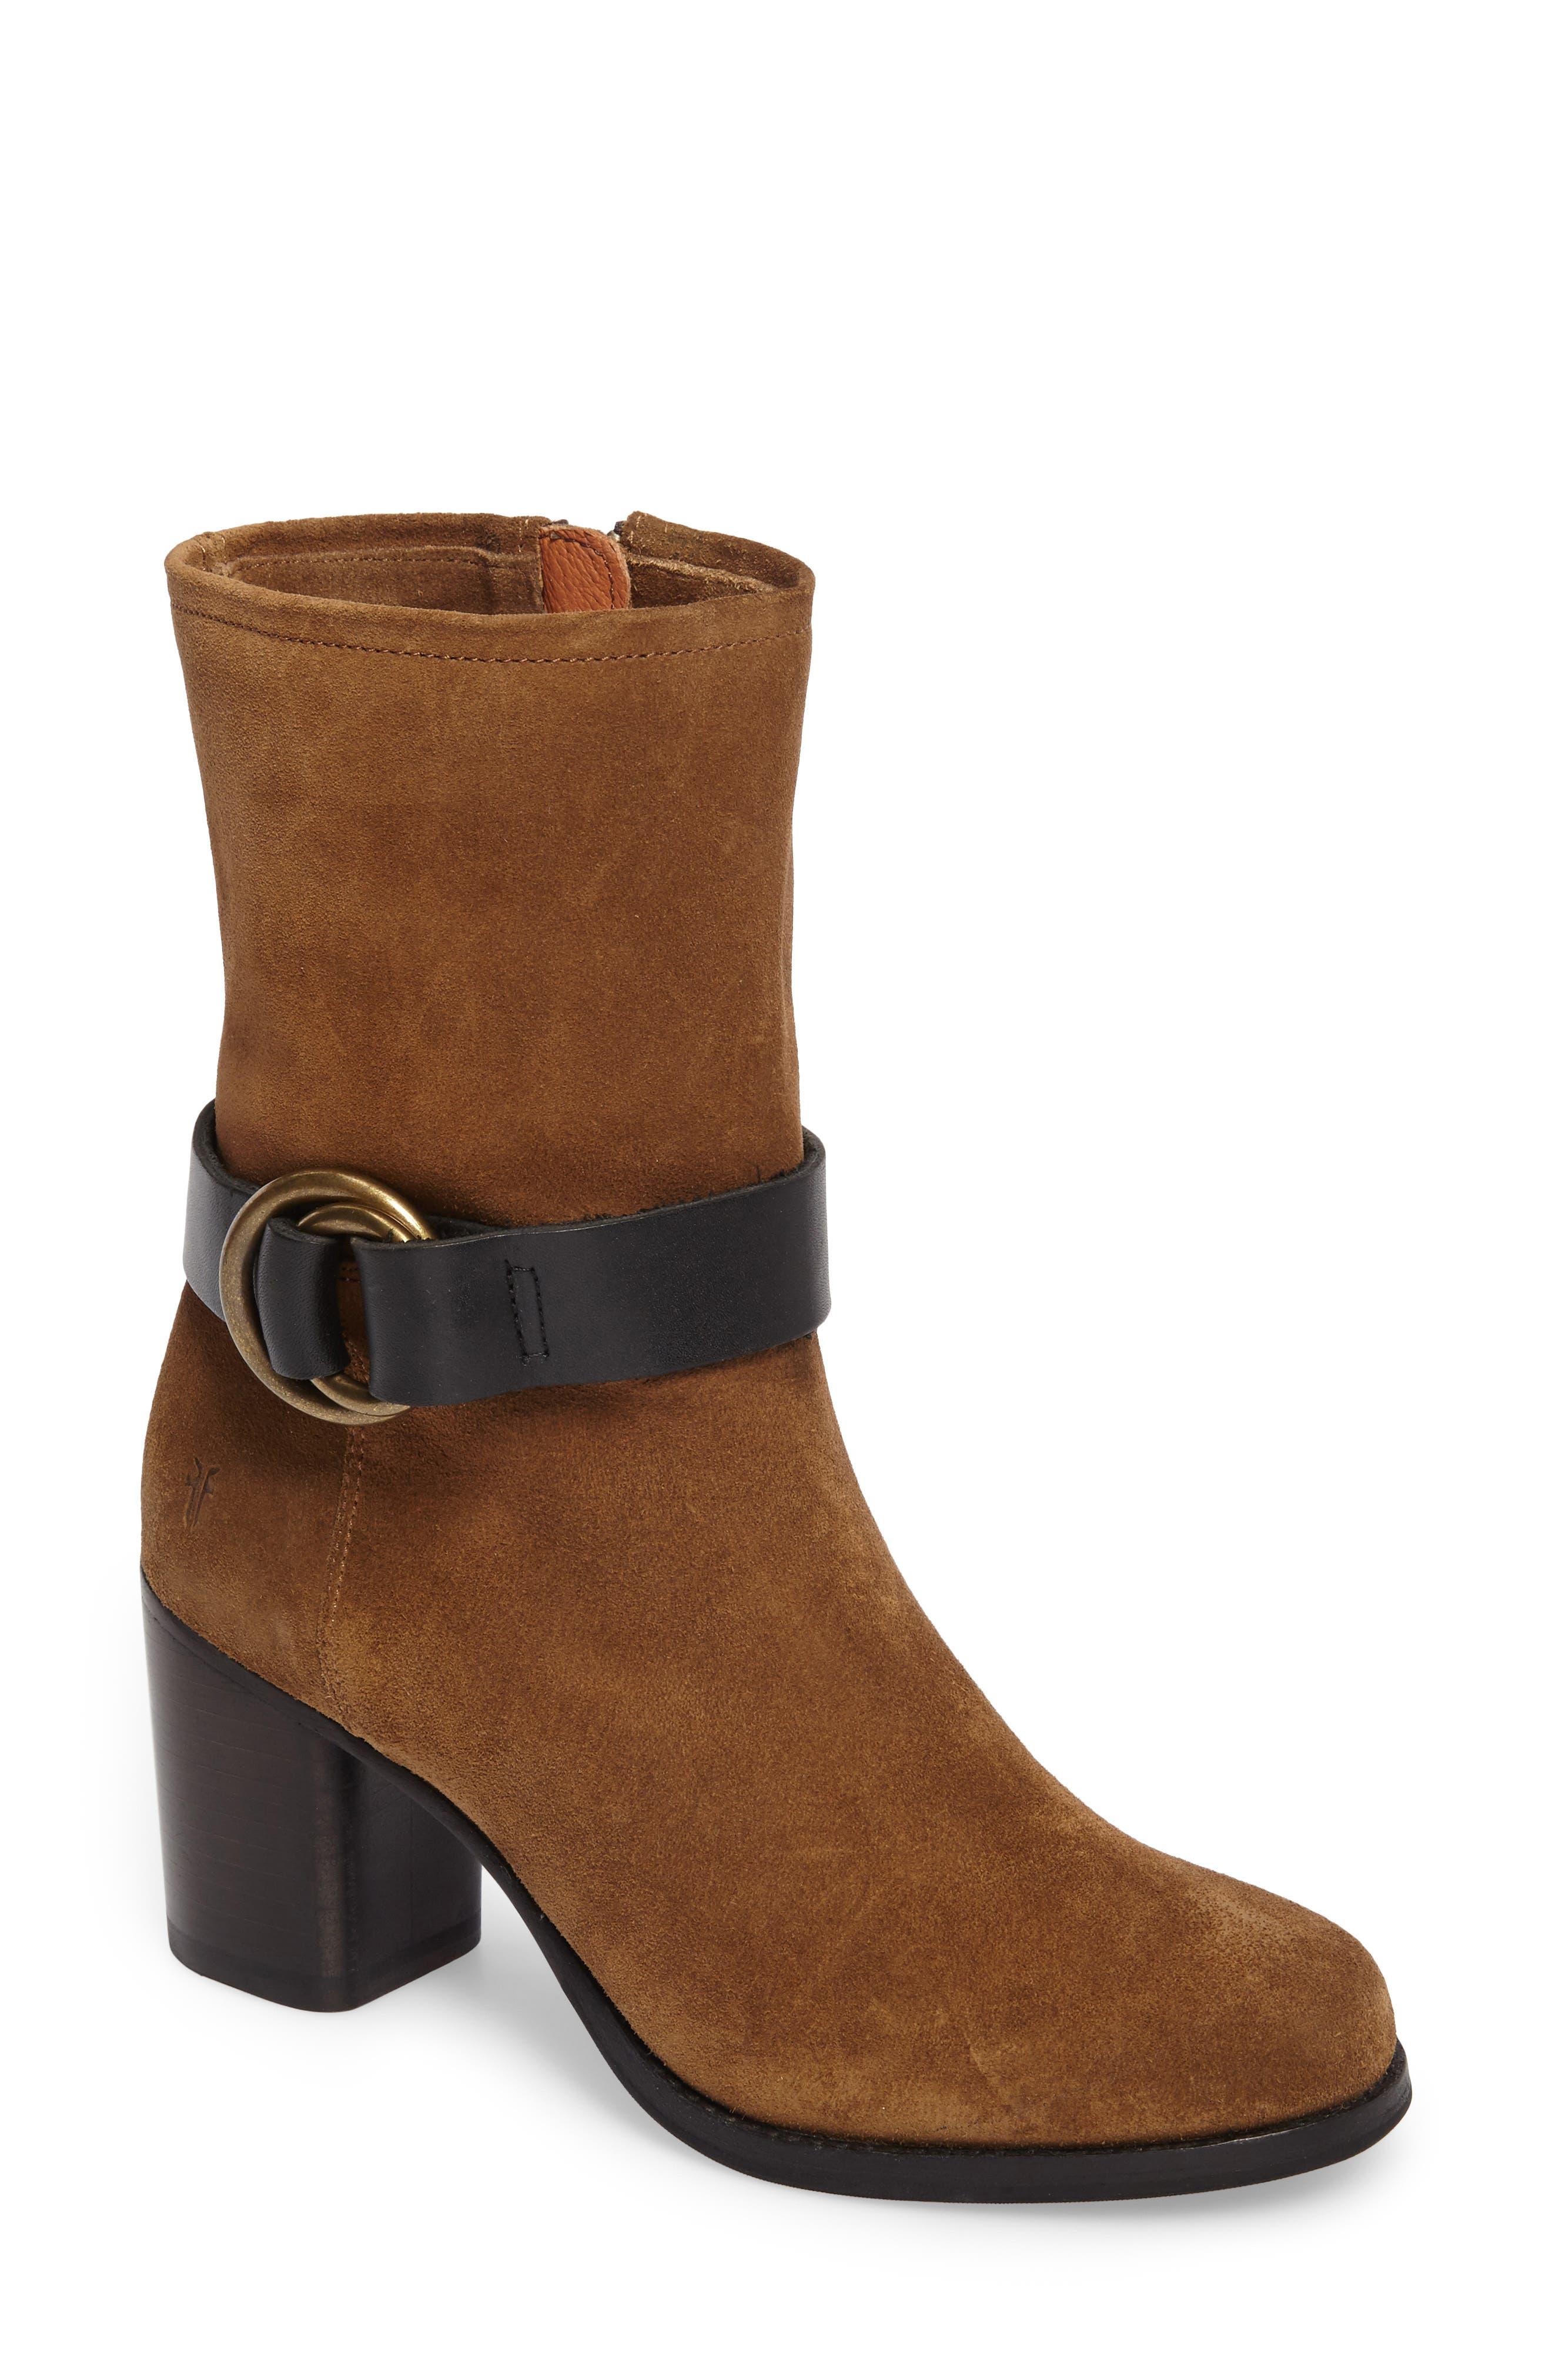 Alternate Image 1 Selected - Frye Addie Harness Boot (Women)